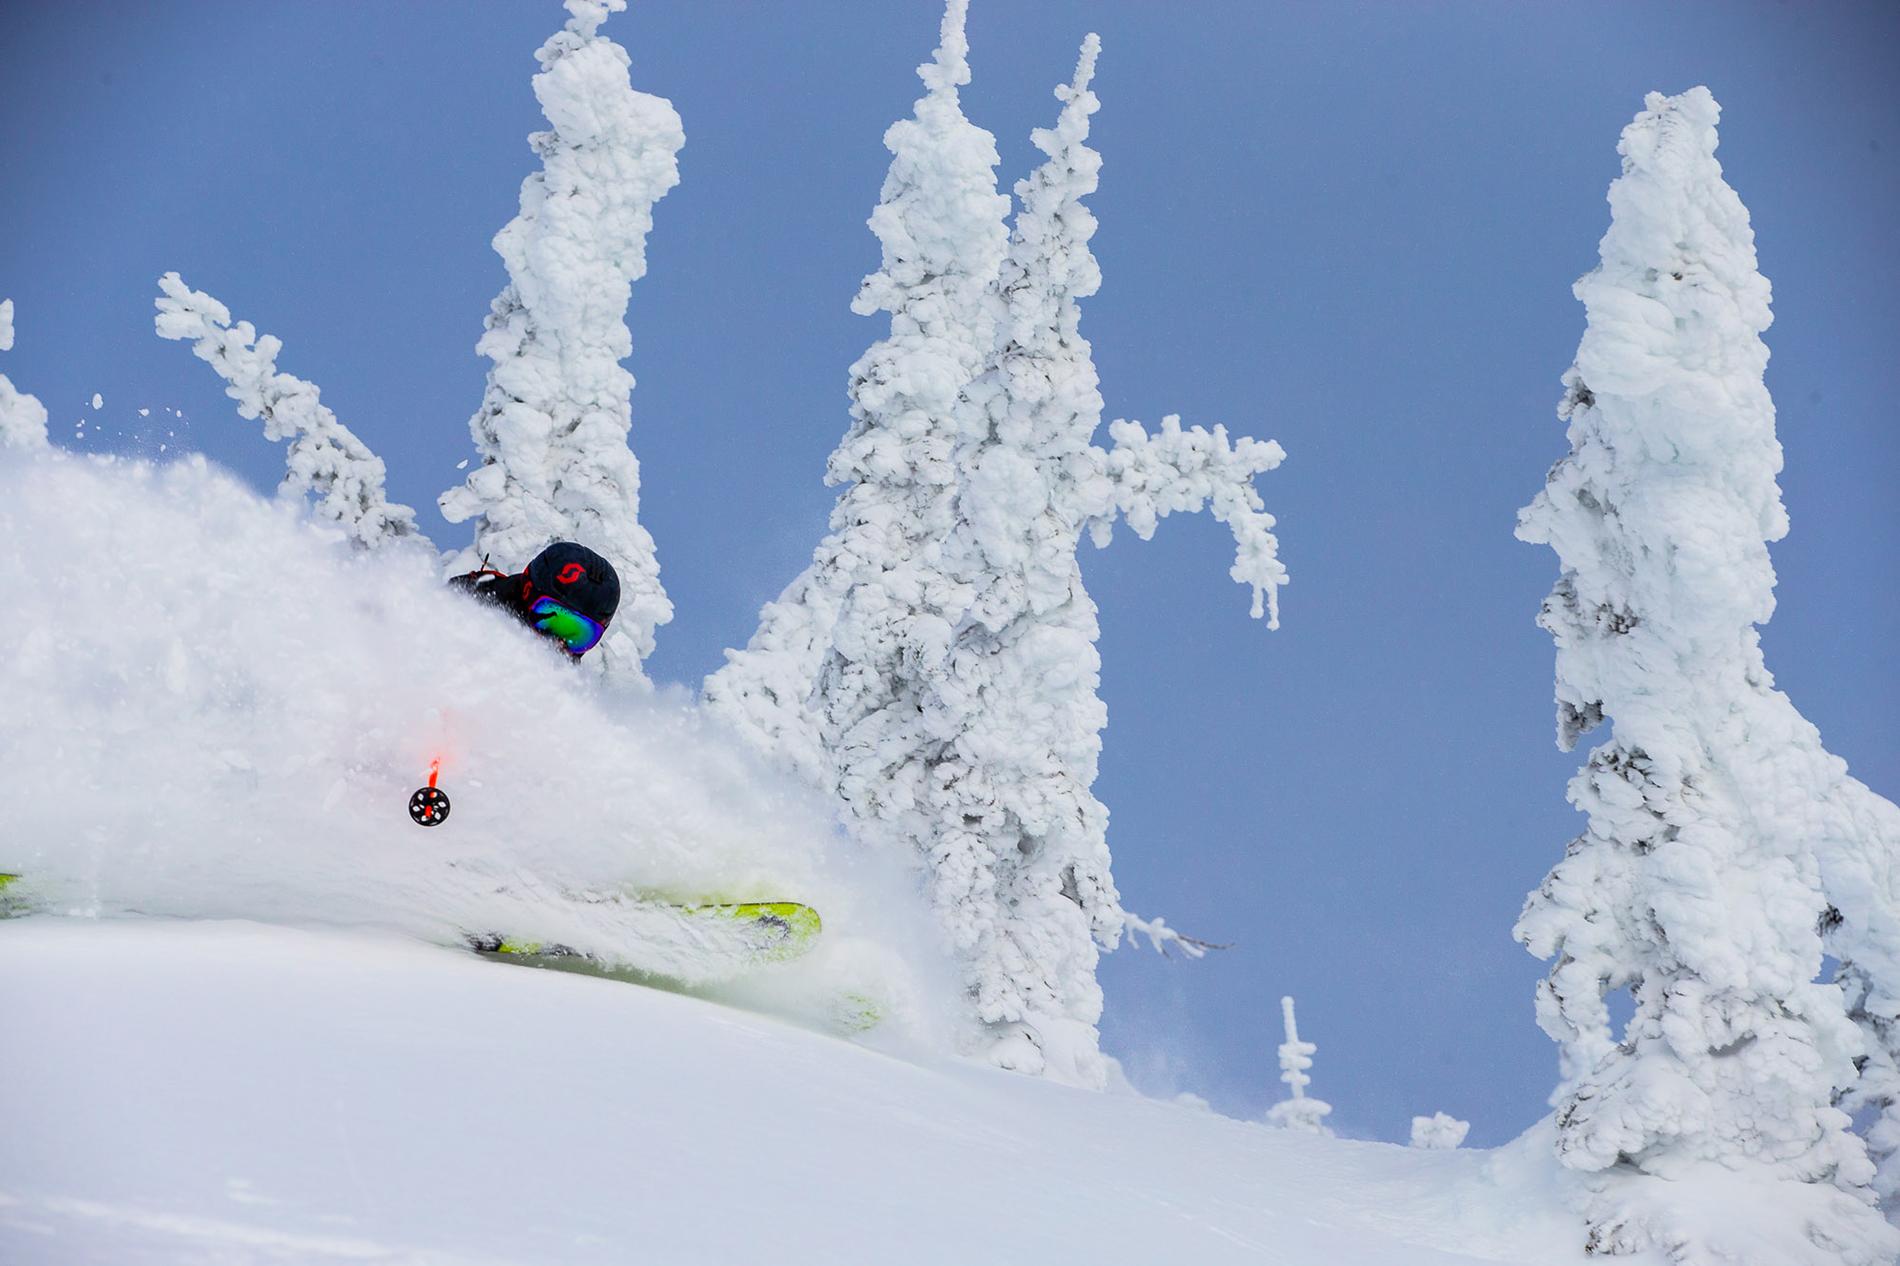 Sam Cohen skiing at Whitefish, MT